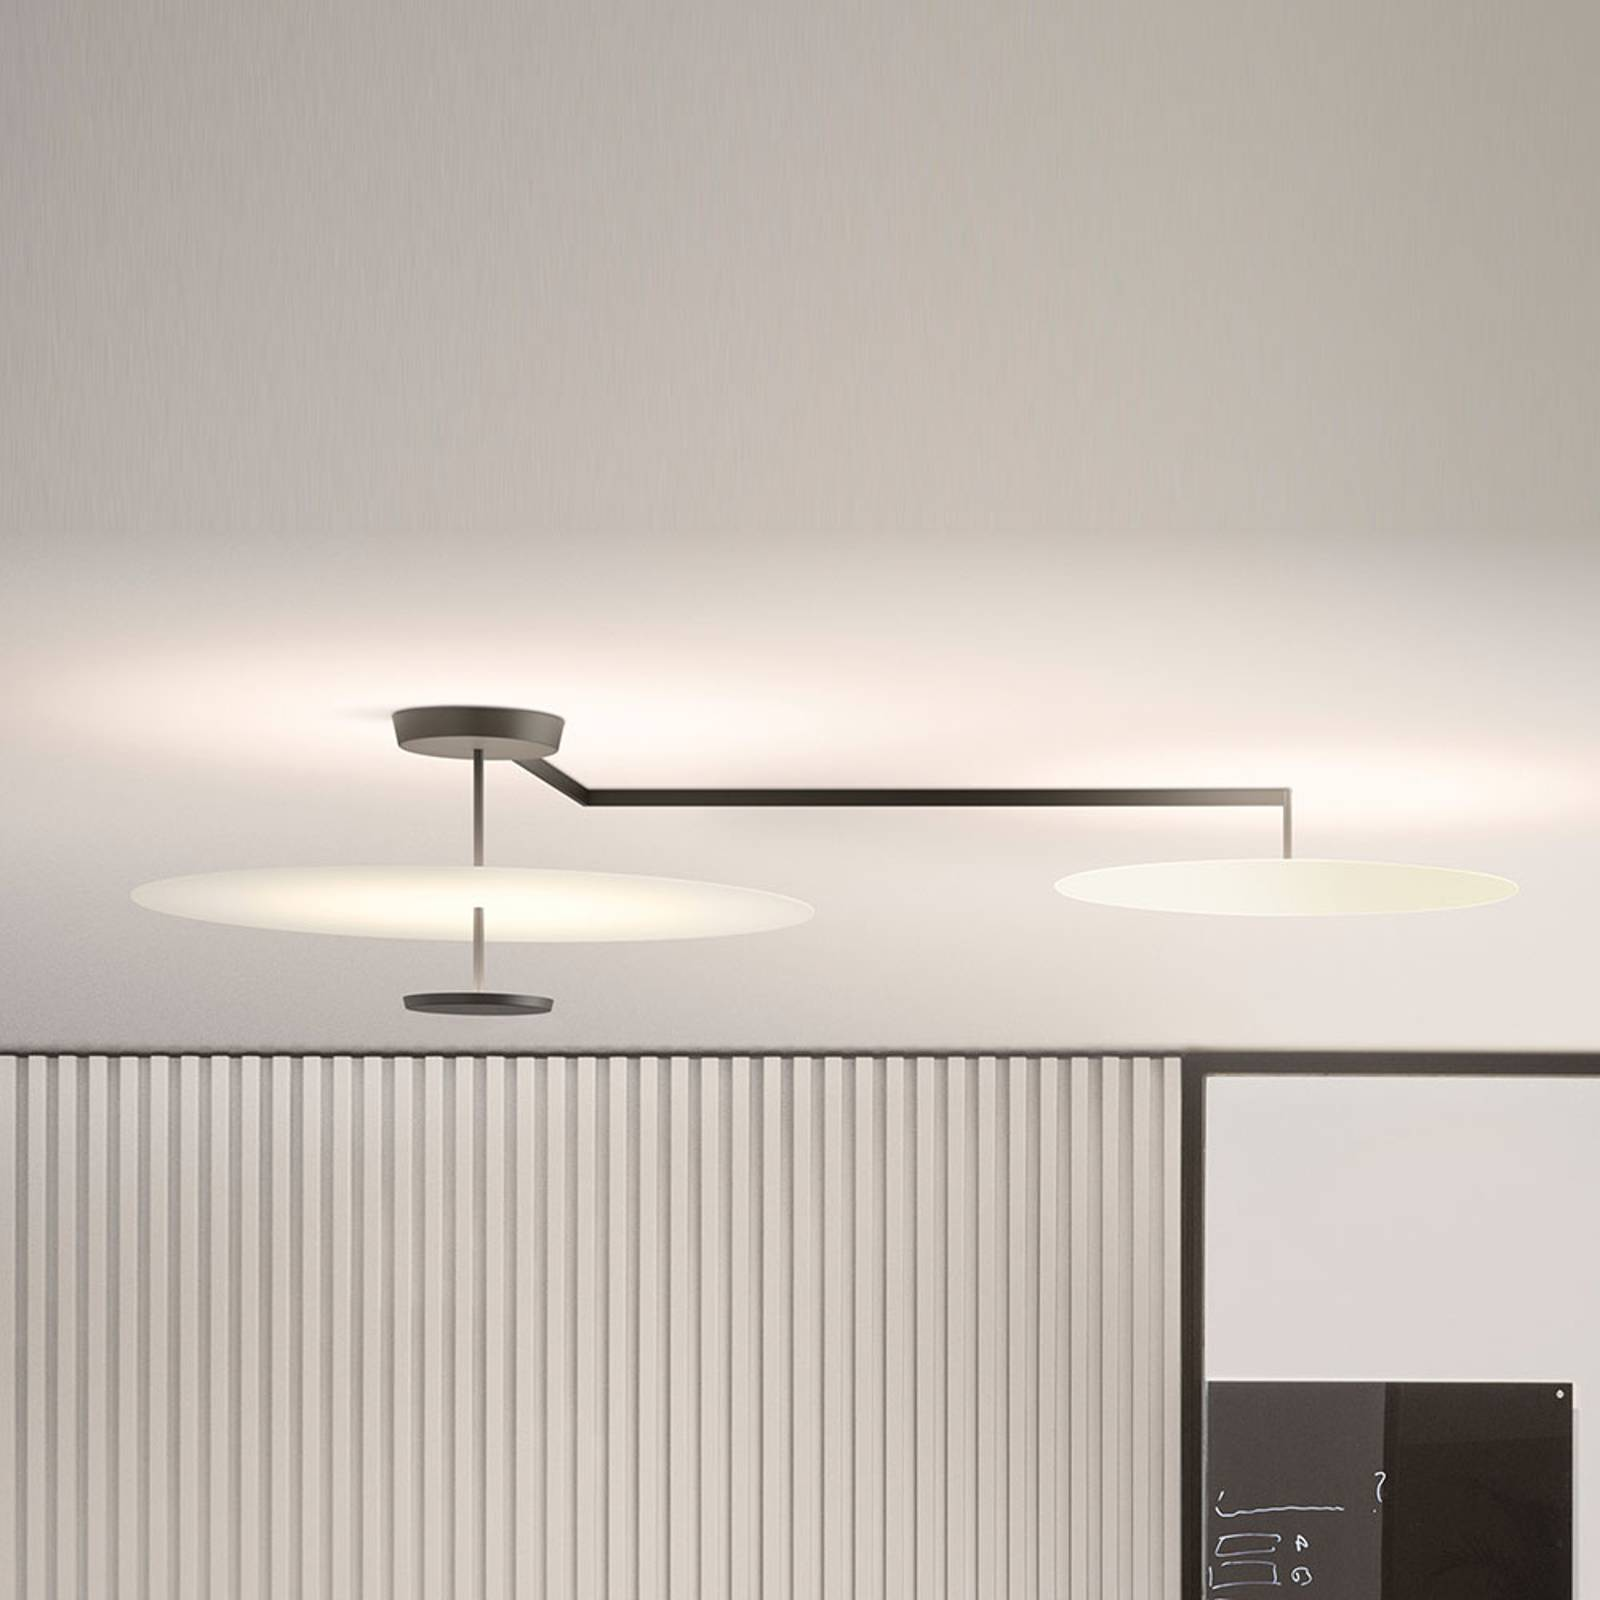 Vibia Flat LED-kattovalaisin 3-lamppuinen Ø 90 cm